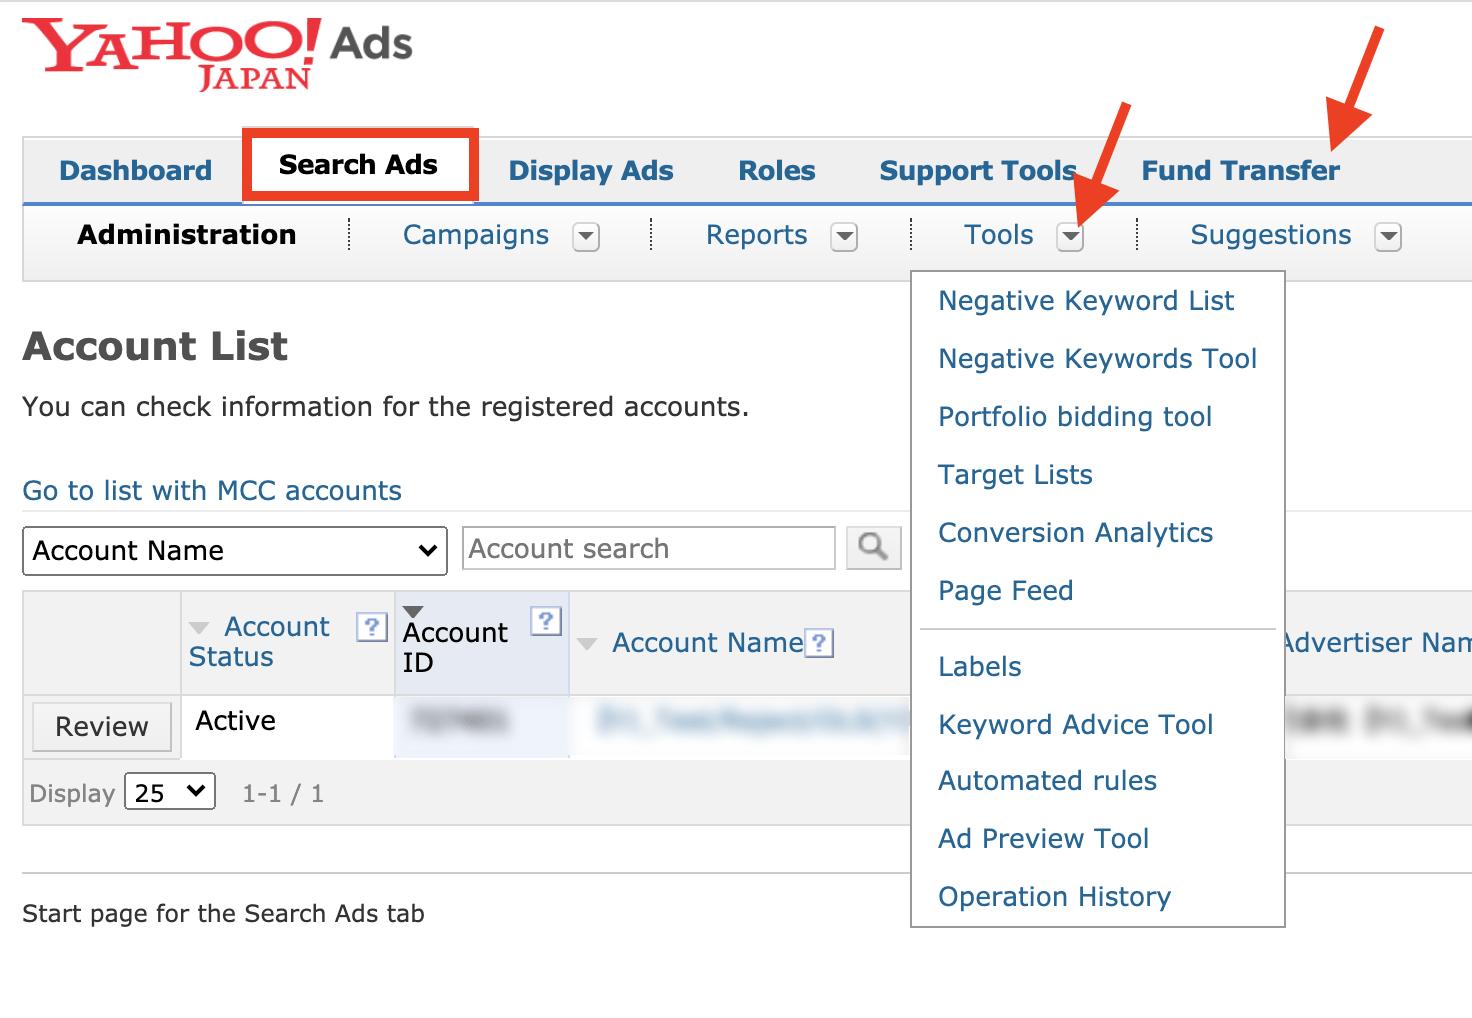 Yahoo! JAPAN campaign management tool desktop | Digital Marketing For Asia